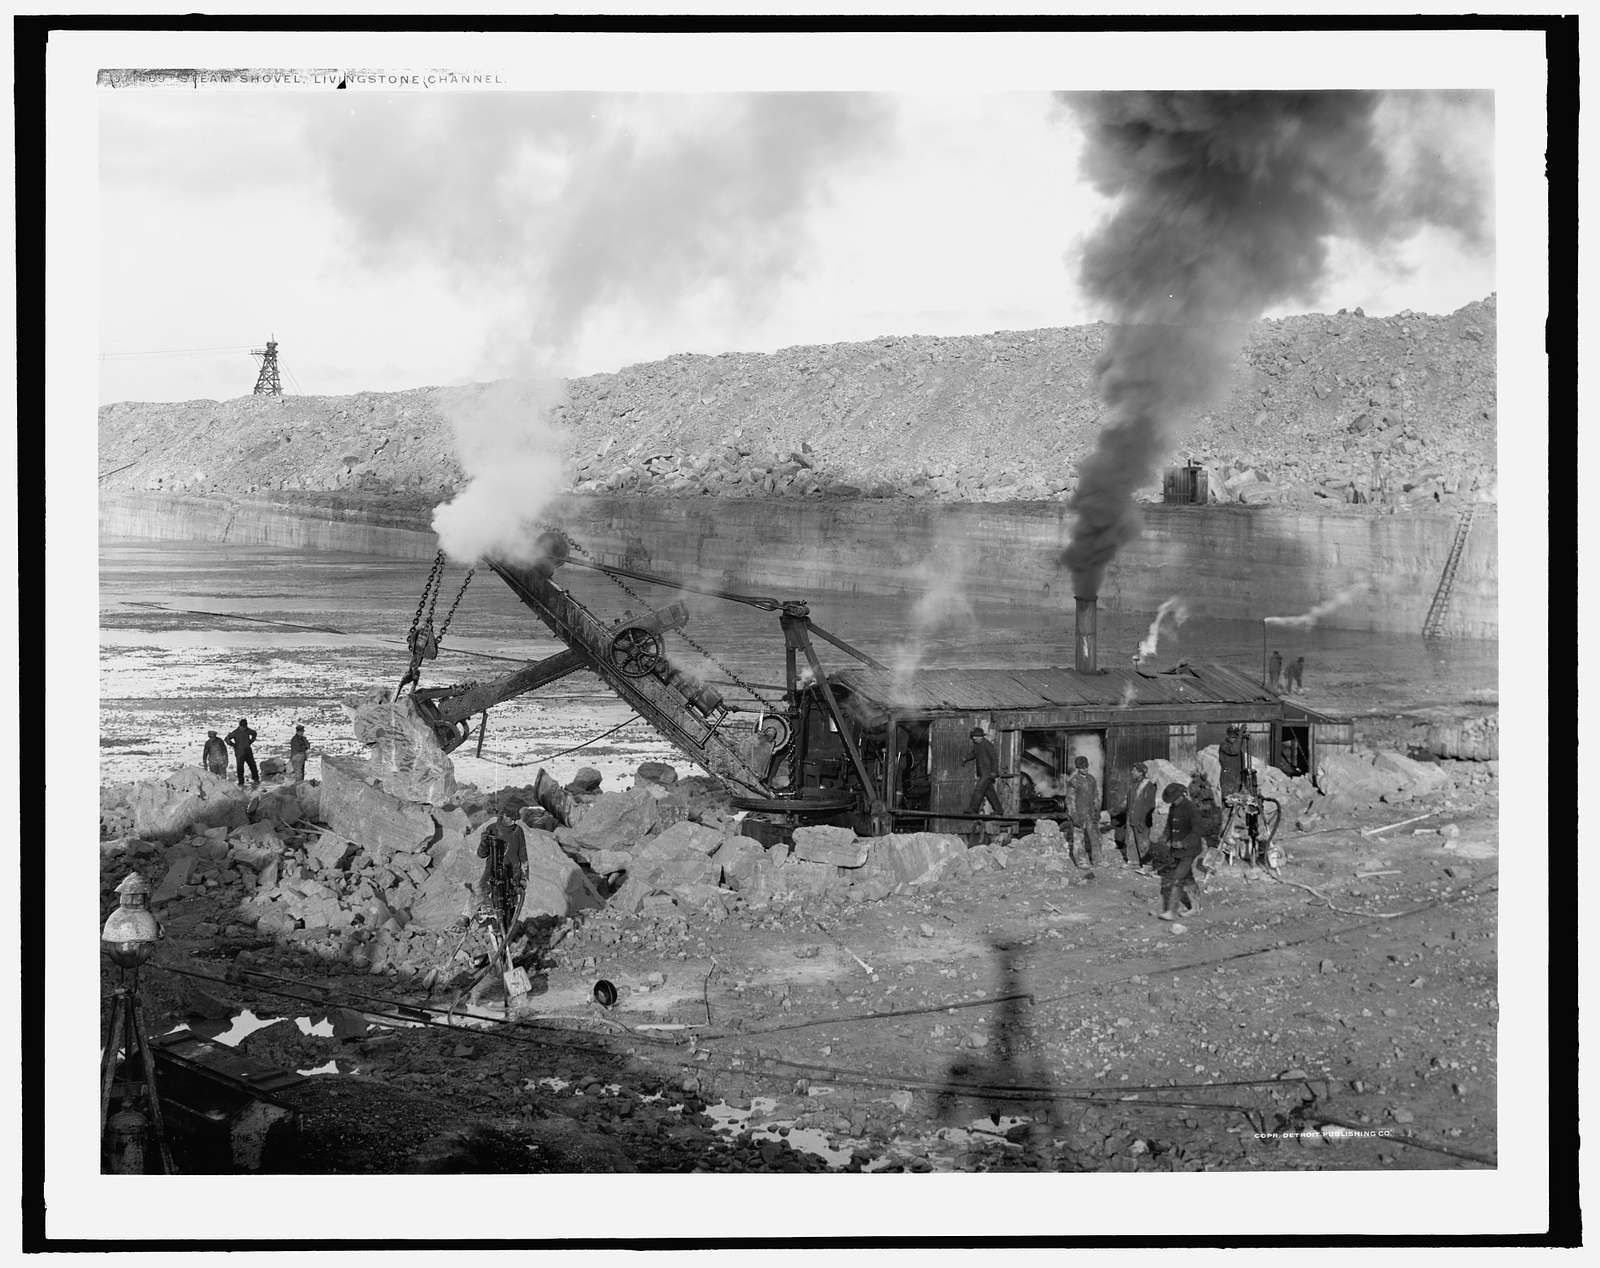 Steam shovel, Livingstone Channel, Stony Island